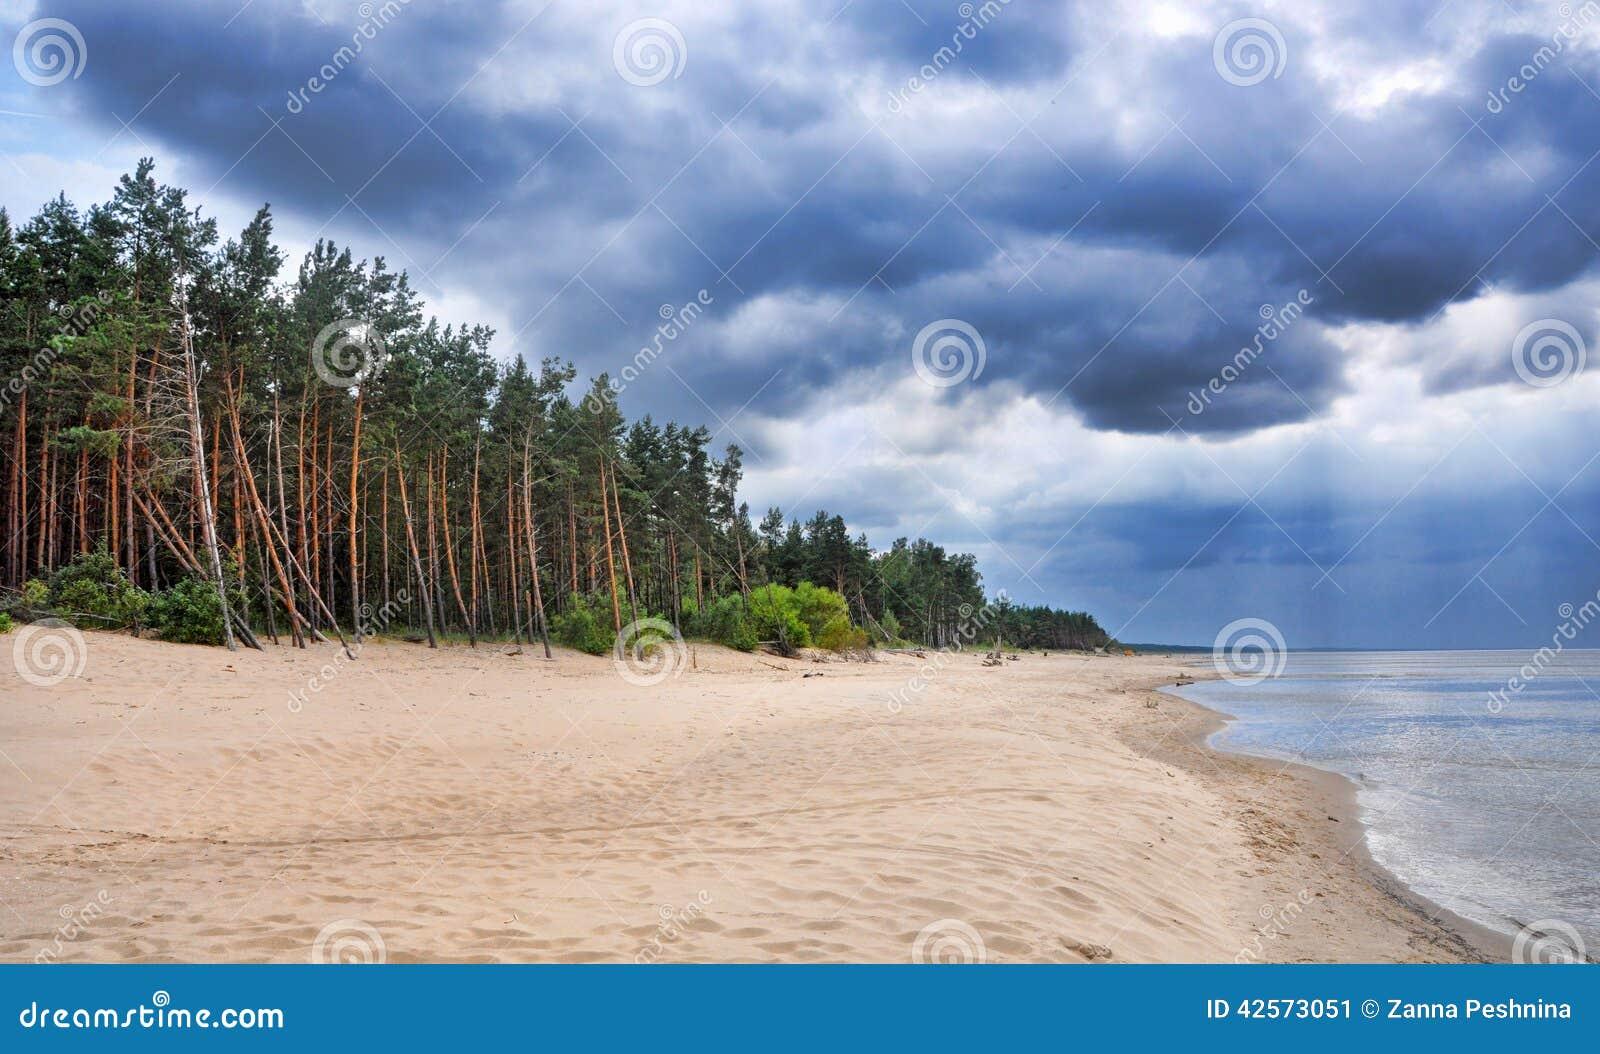 Saulkrasti, η θάλασσα της Βαλτικής, Λετονία